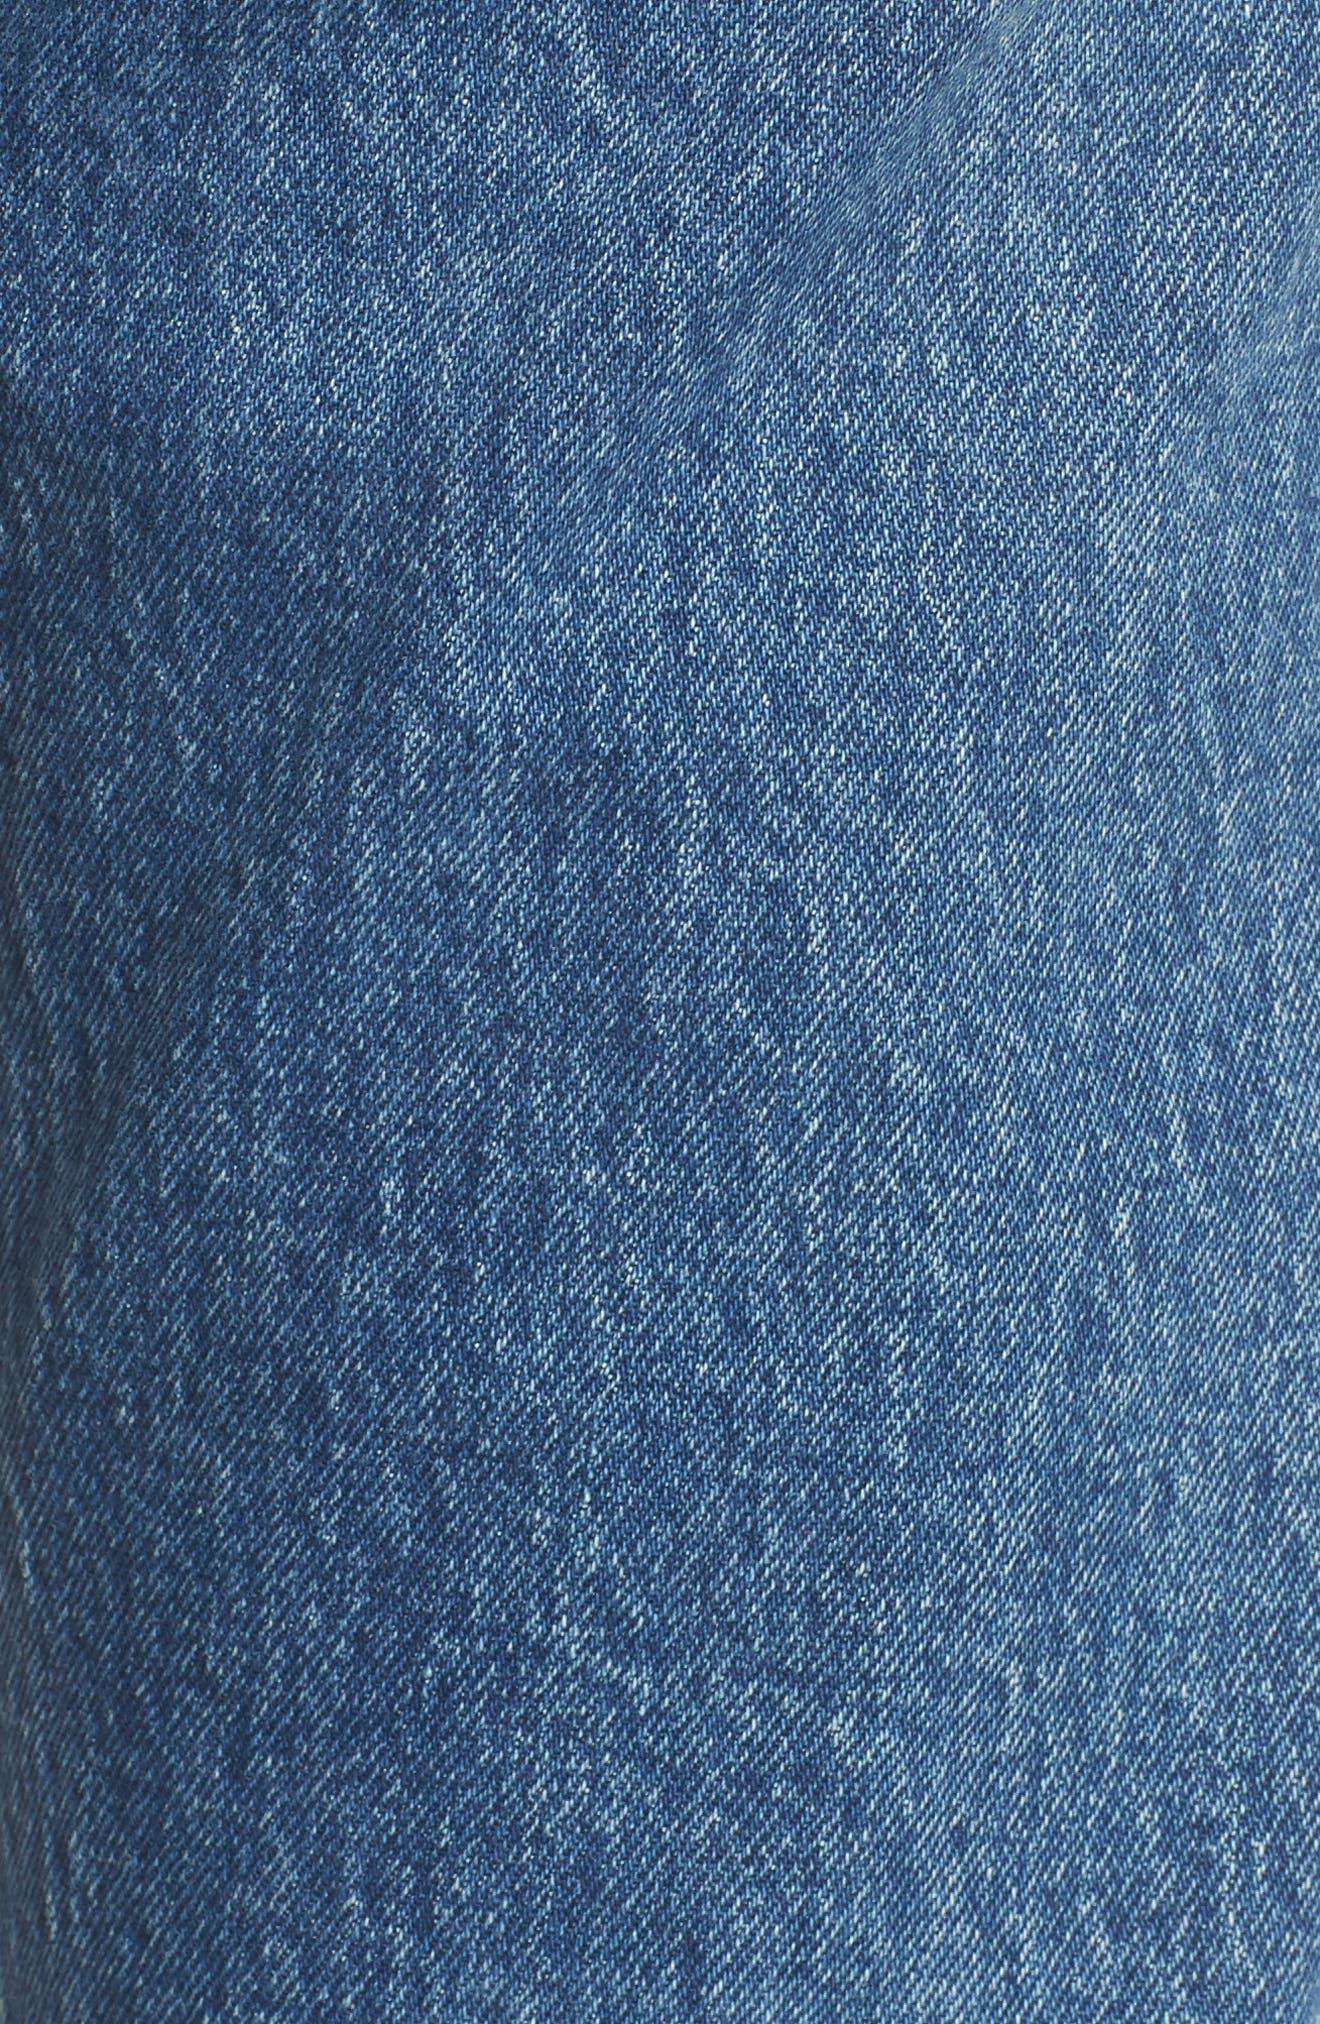 LEVI'S<SUP>®</SUP>, Wedgie Raw Hem High Waist Straight Leg Jeans, Alternate thumbnail 6, color, LOVE TRIANGLE